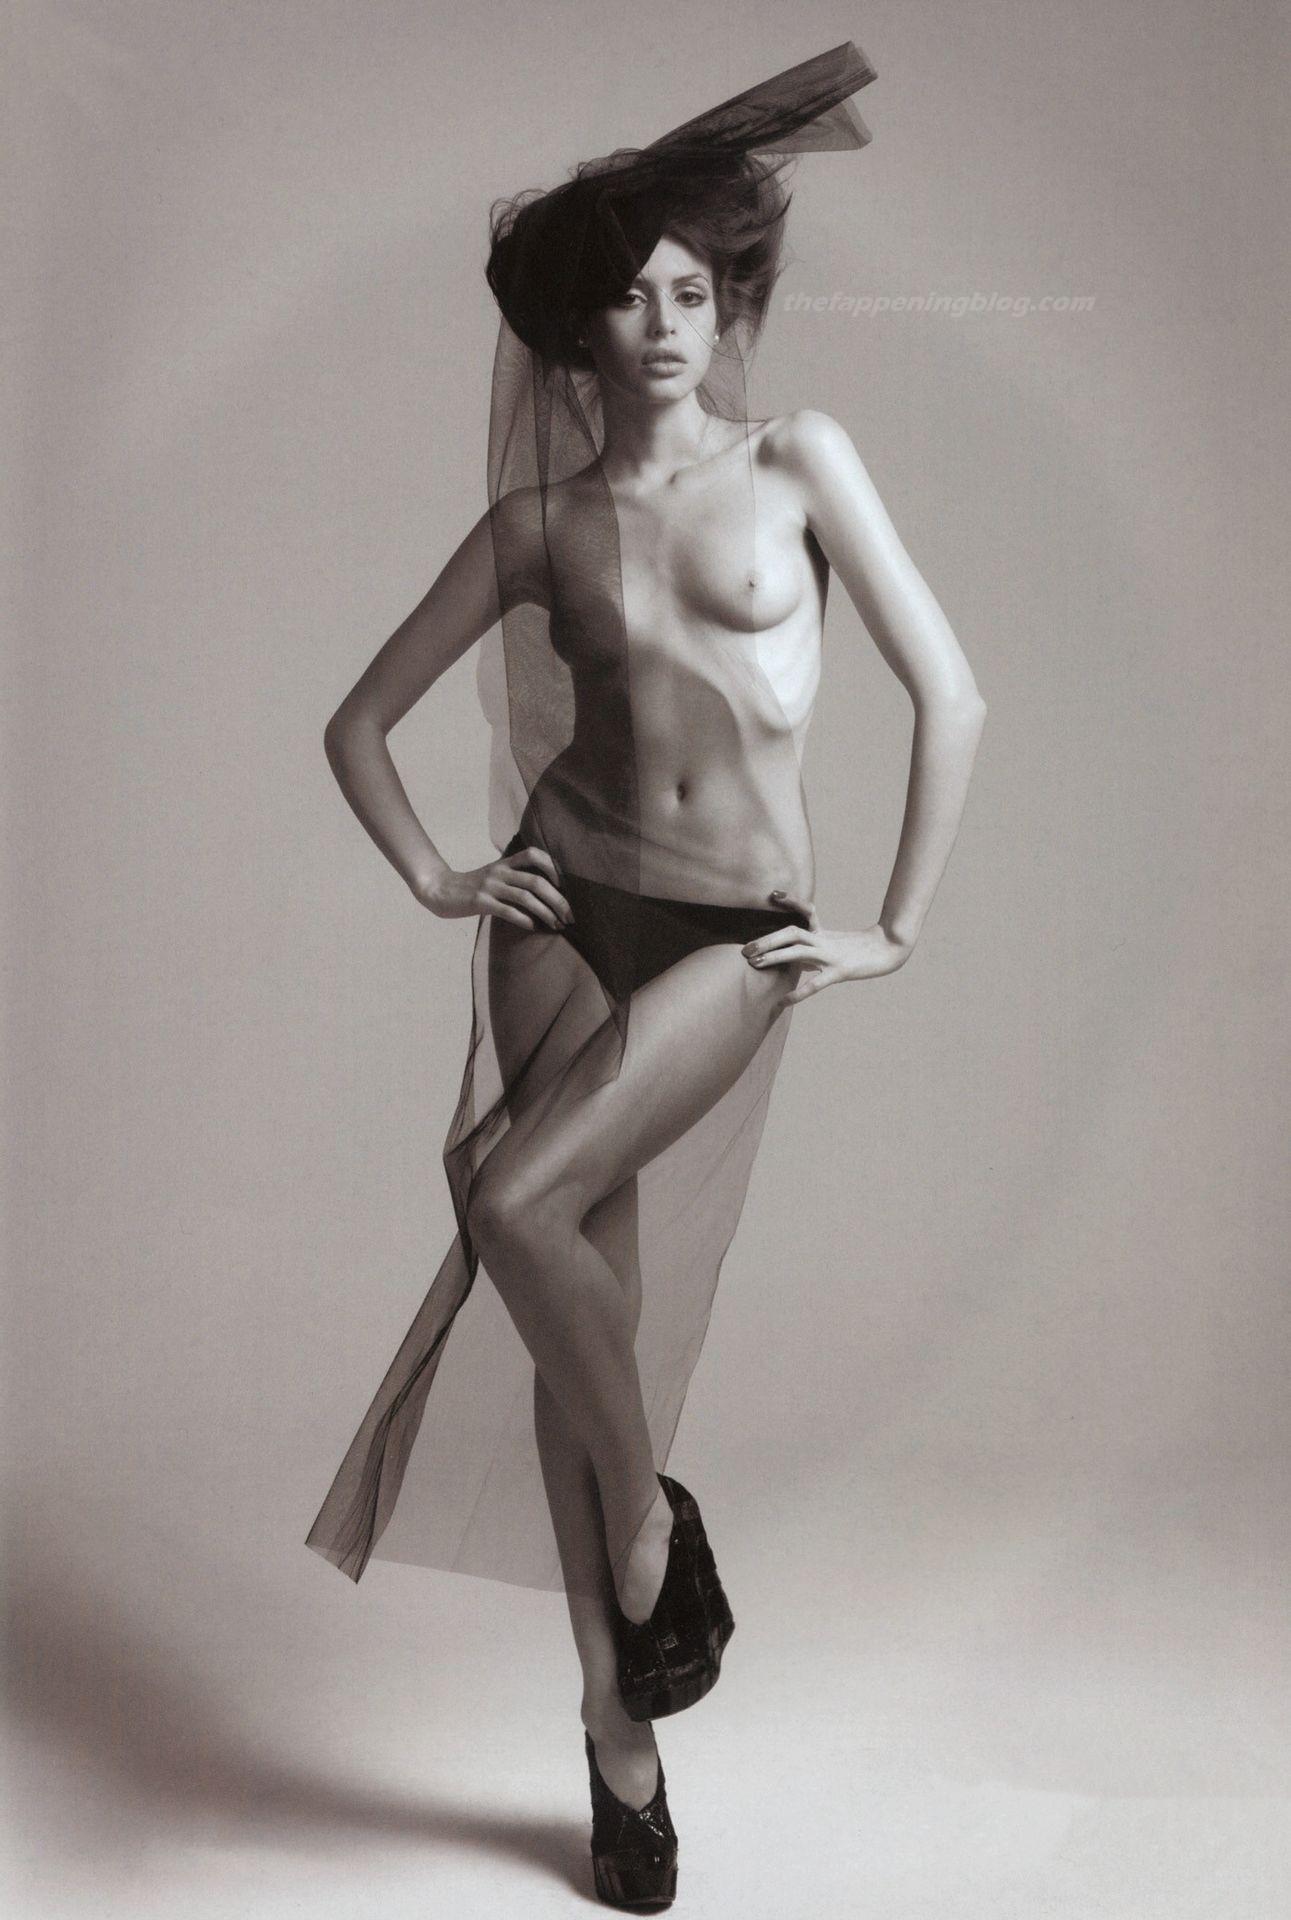 Sean Lennon And Girlfriend Recreate John And Yoko Rolling Stone Nude Cover Photo